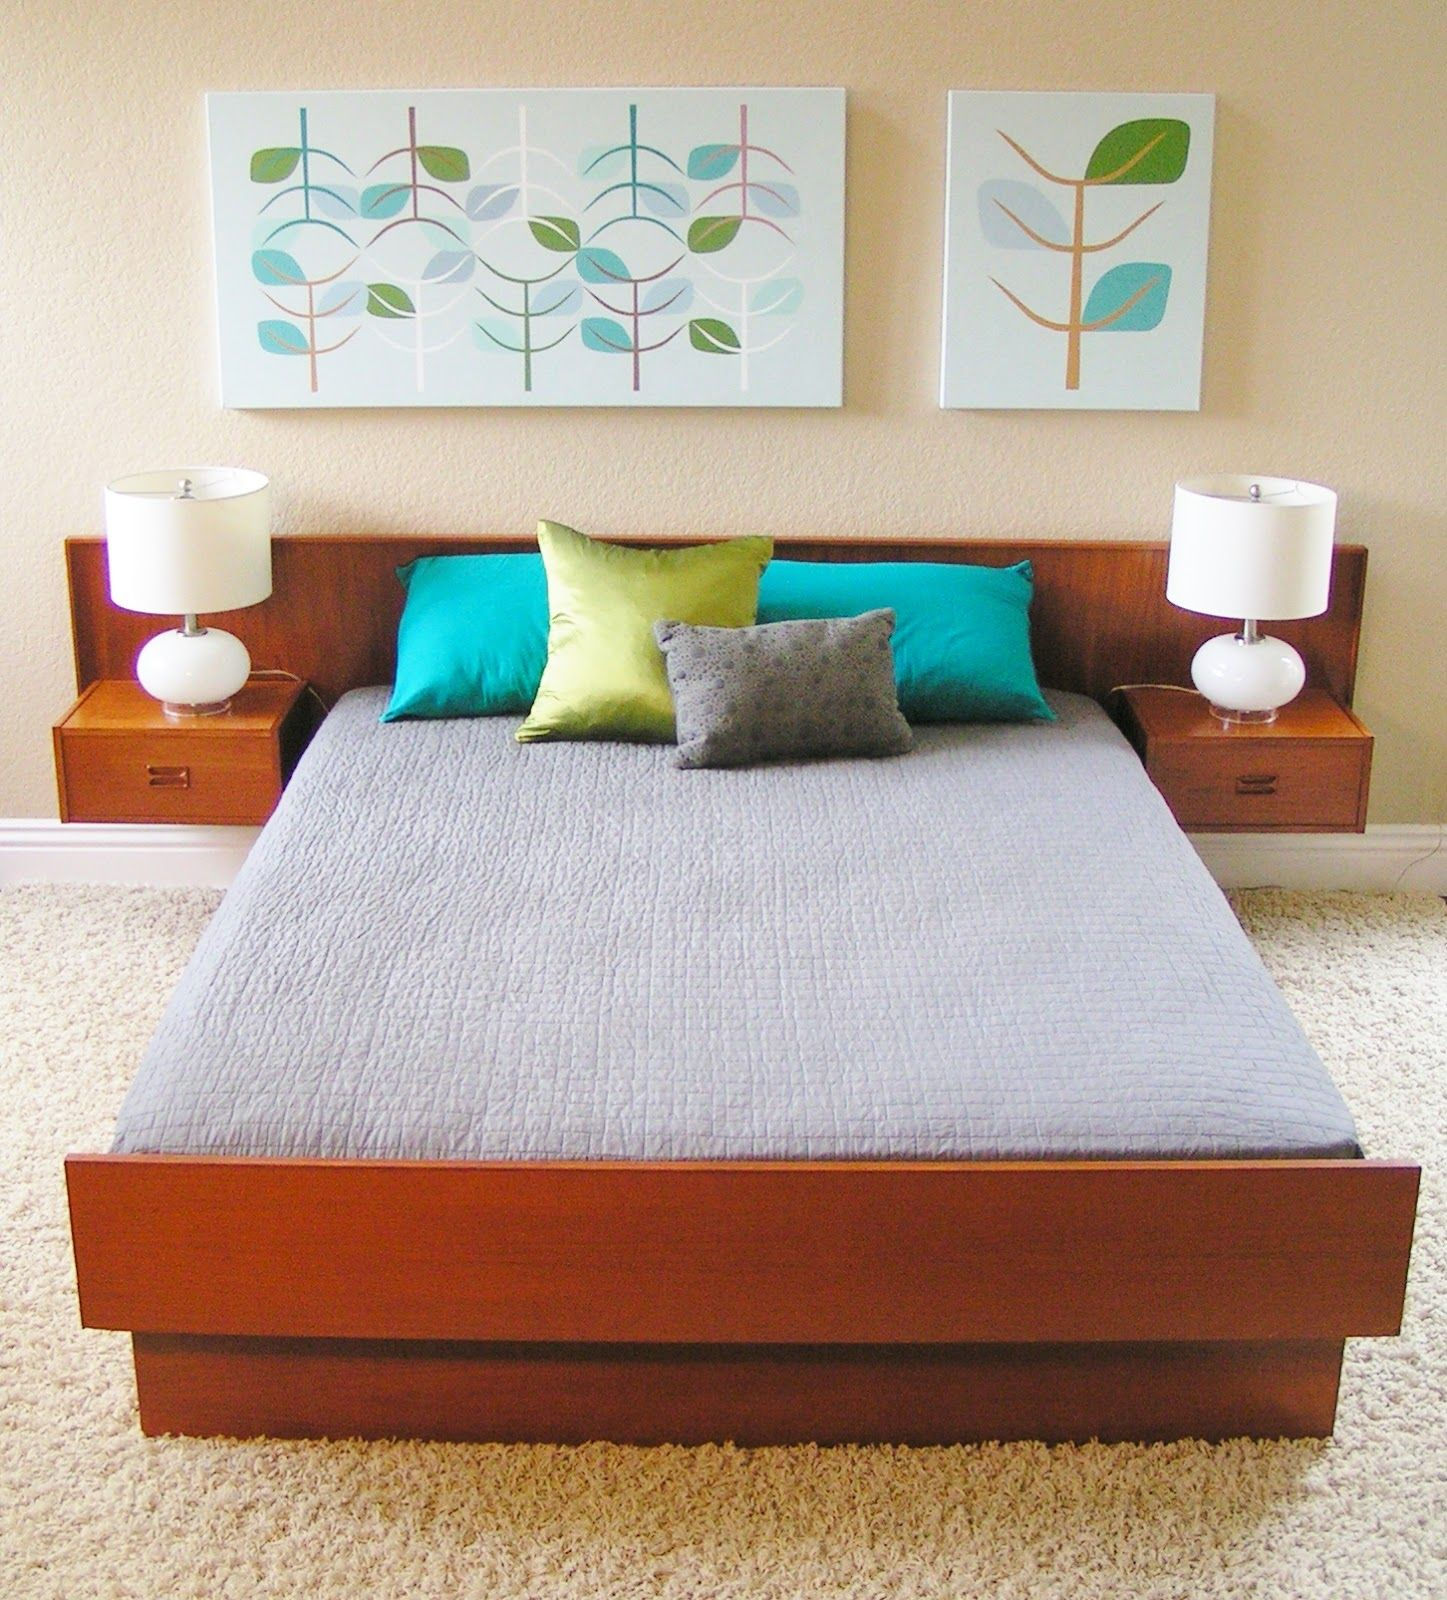 floating chair for bedroom cane barrel vintage mid century danish modern queen teak platform bed